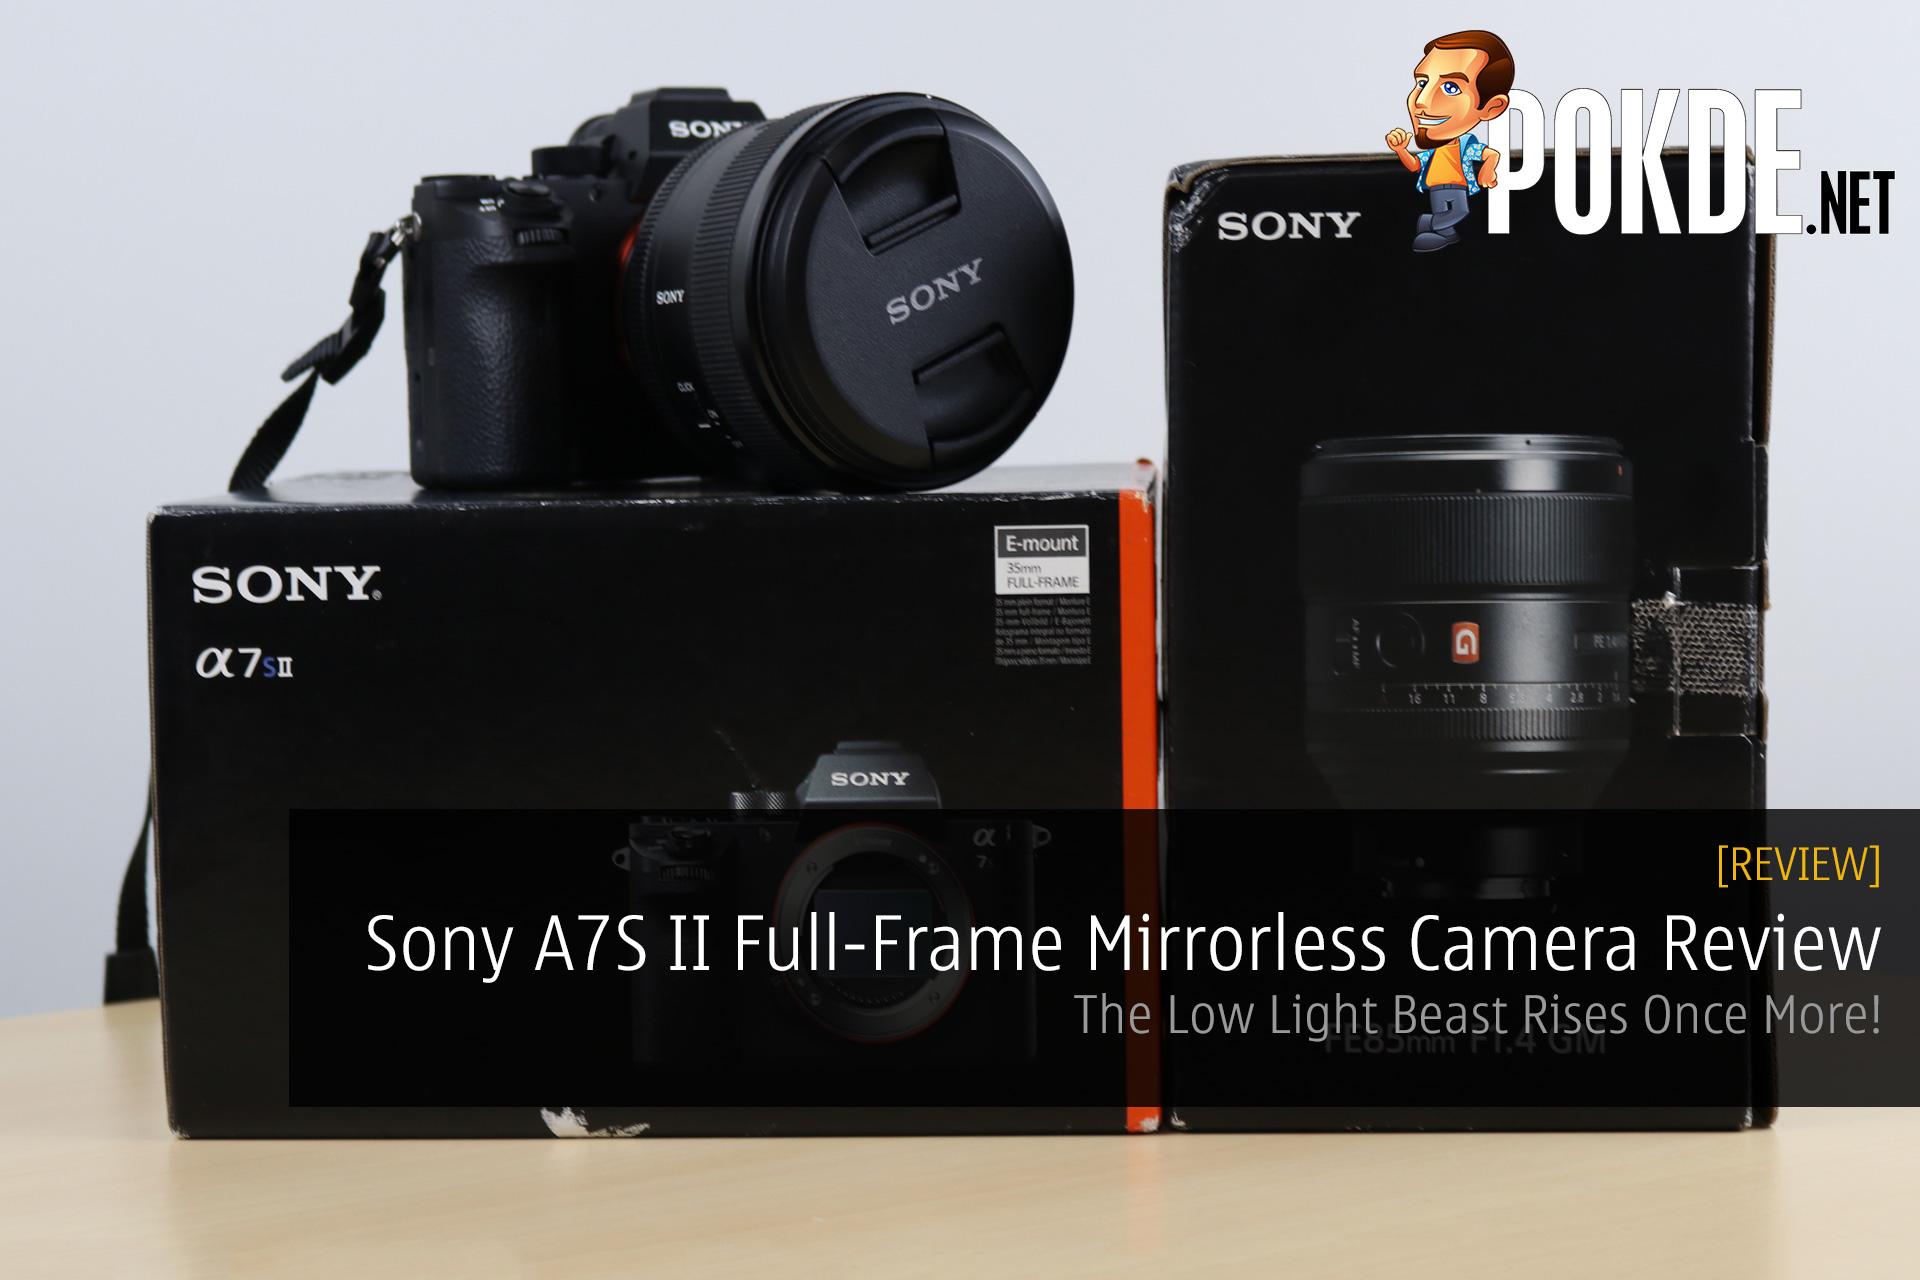 Sony A7S II Full Frame Mirrorless Camera Review U2014 The Low Light Beast Rises  Once More U2013 Pokde